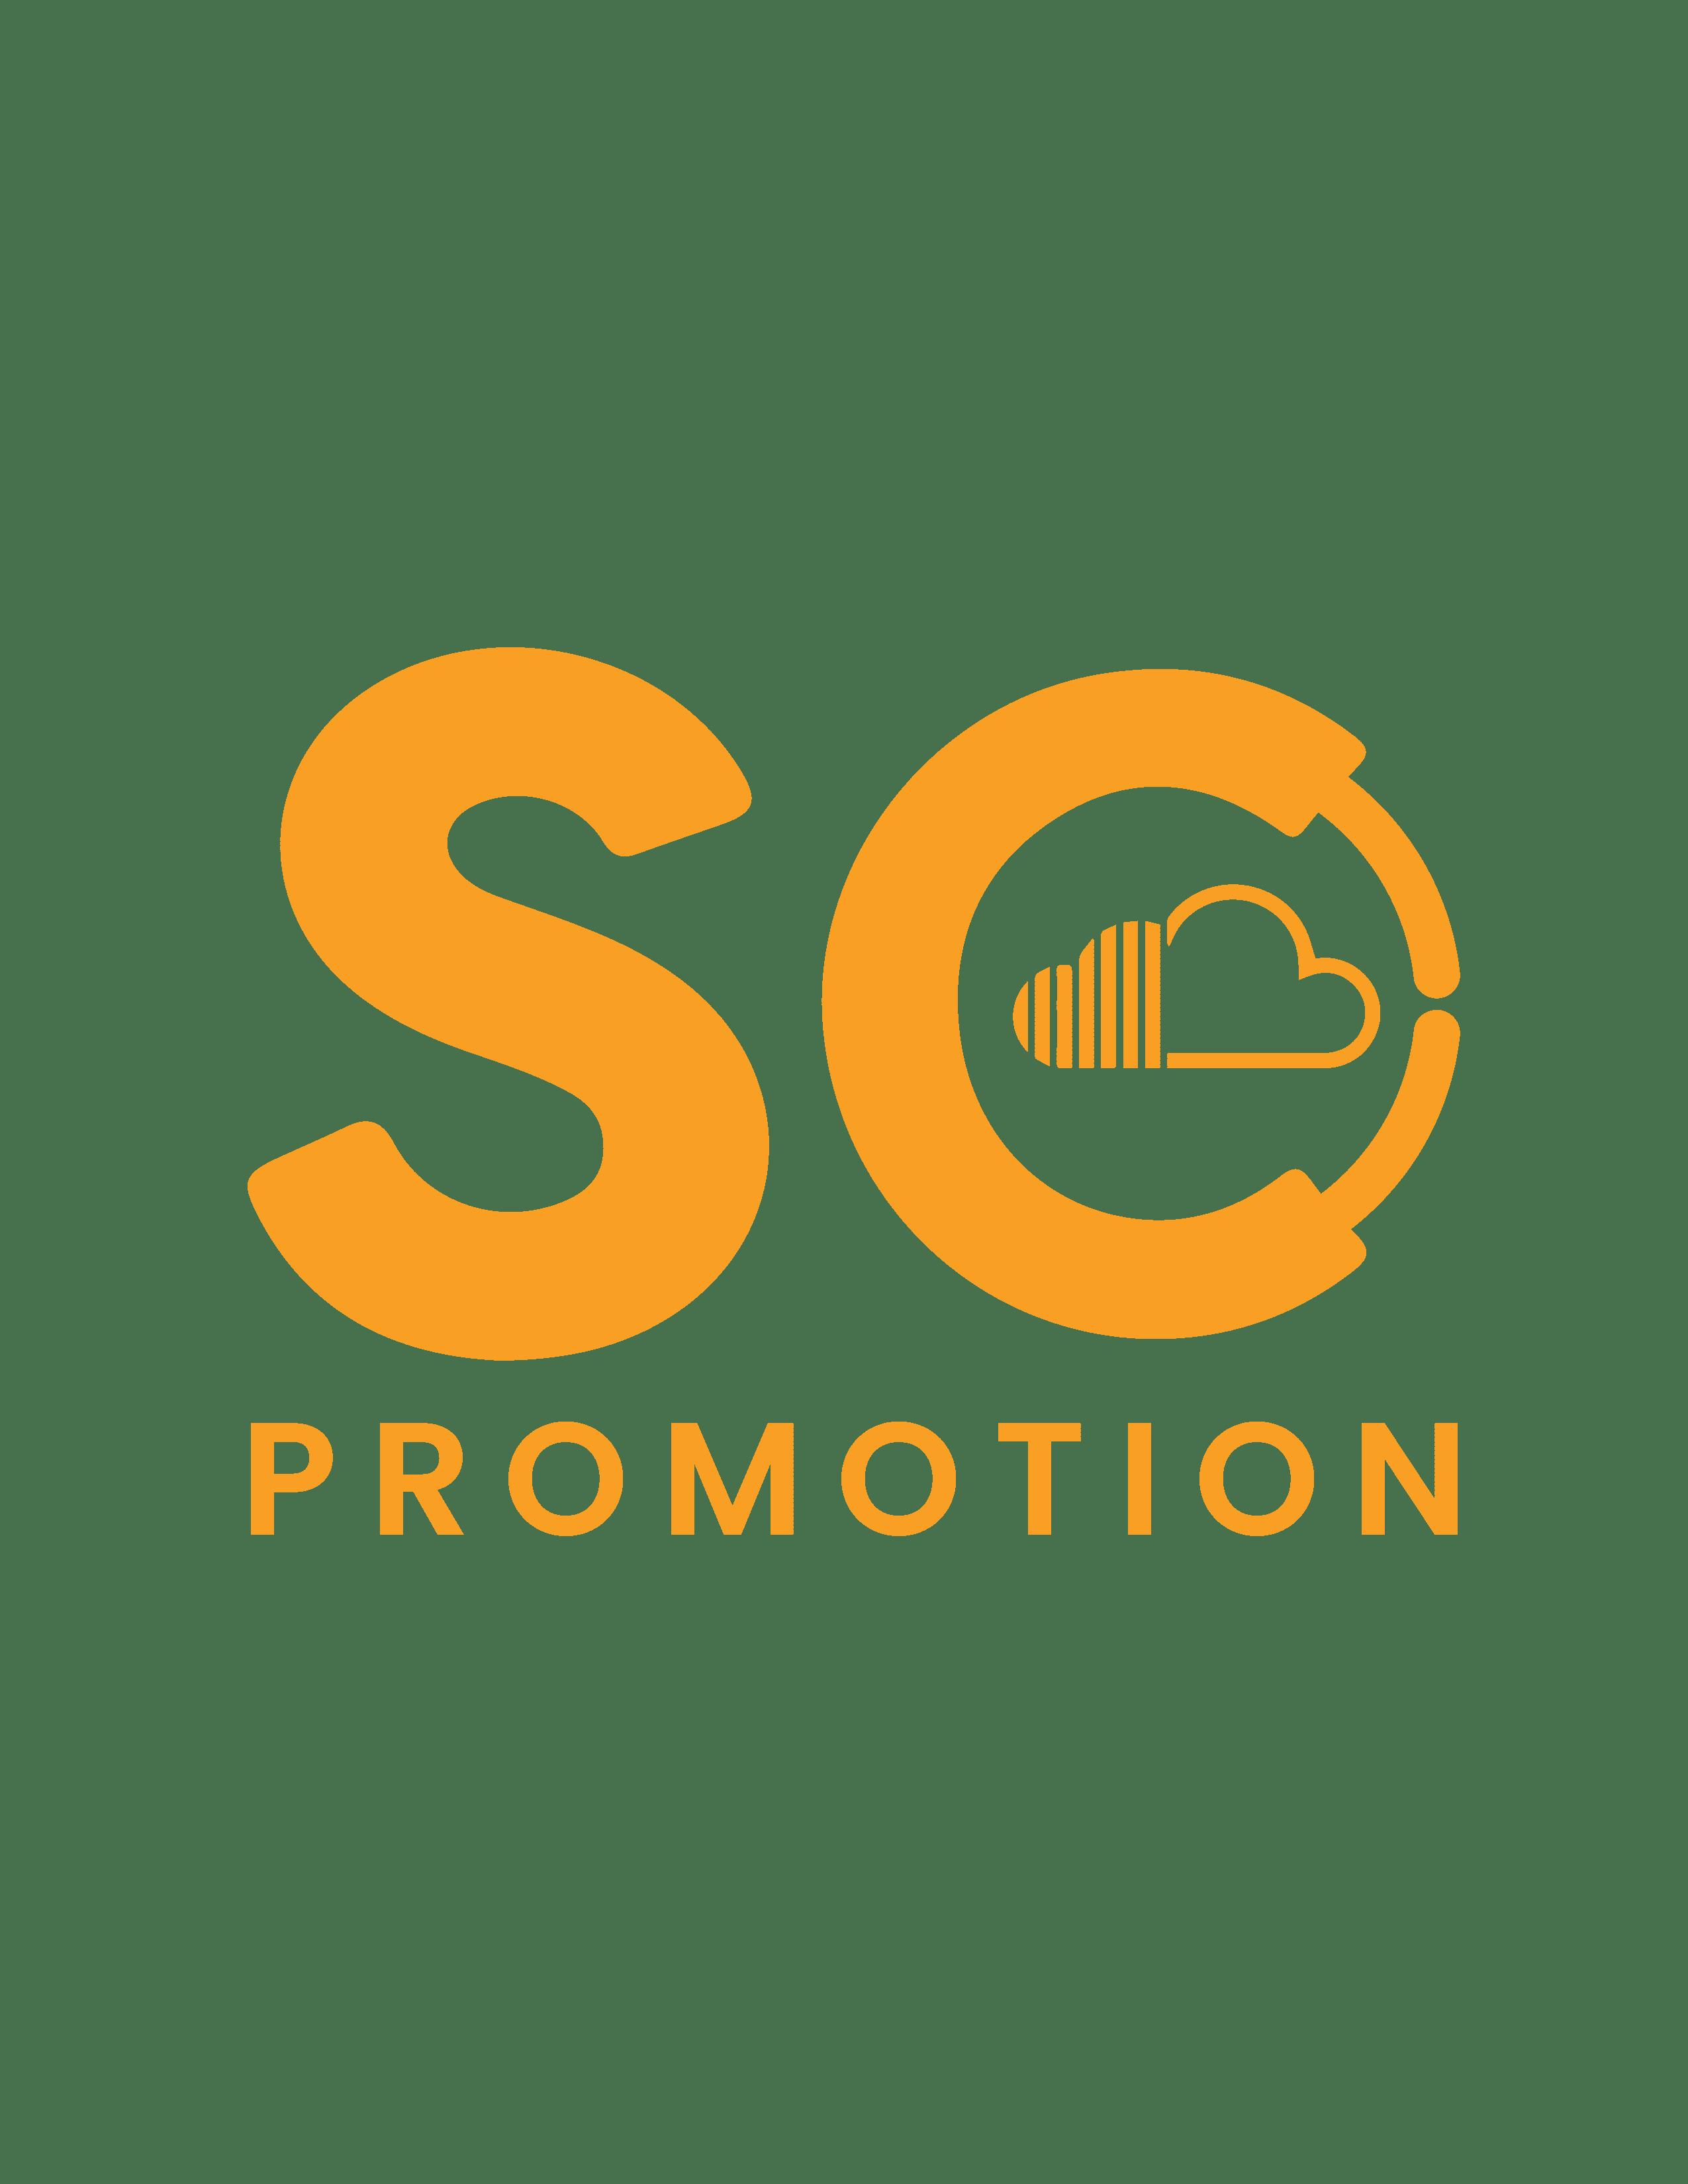 soundcloudpromotion.net Logo